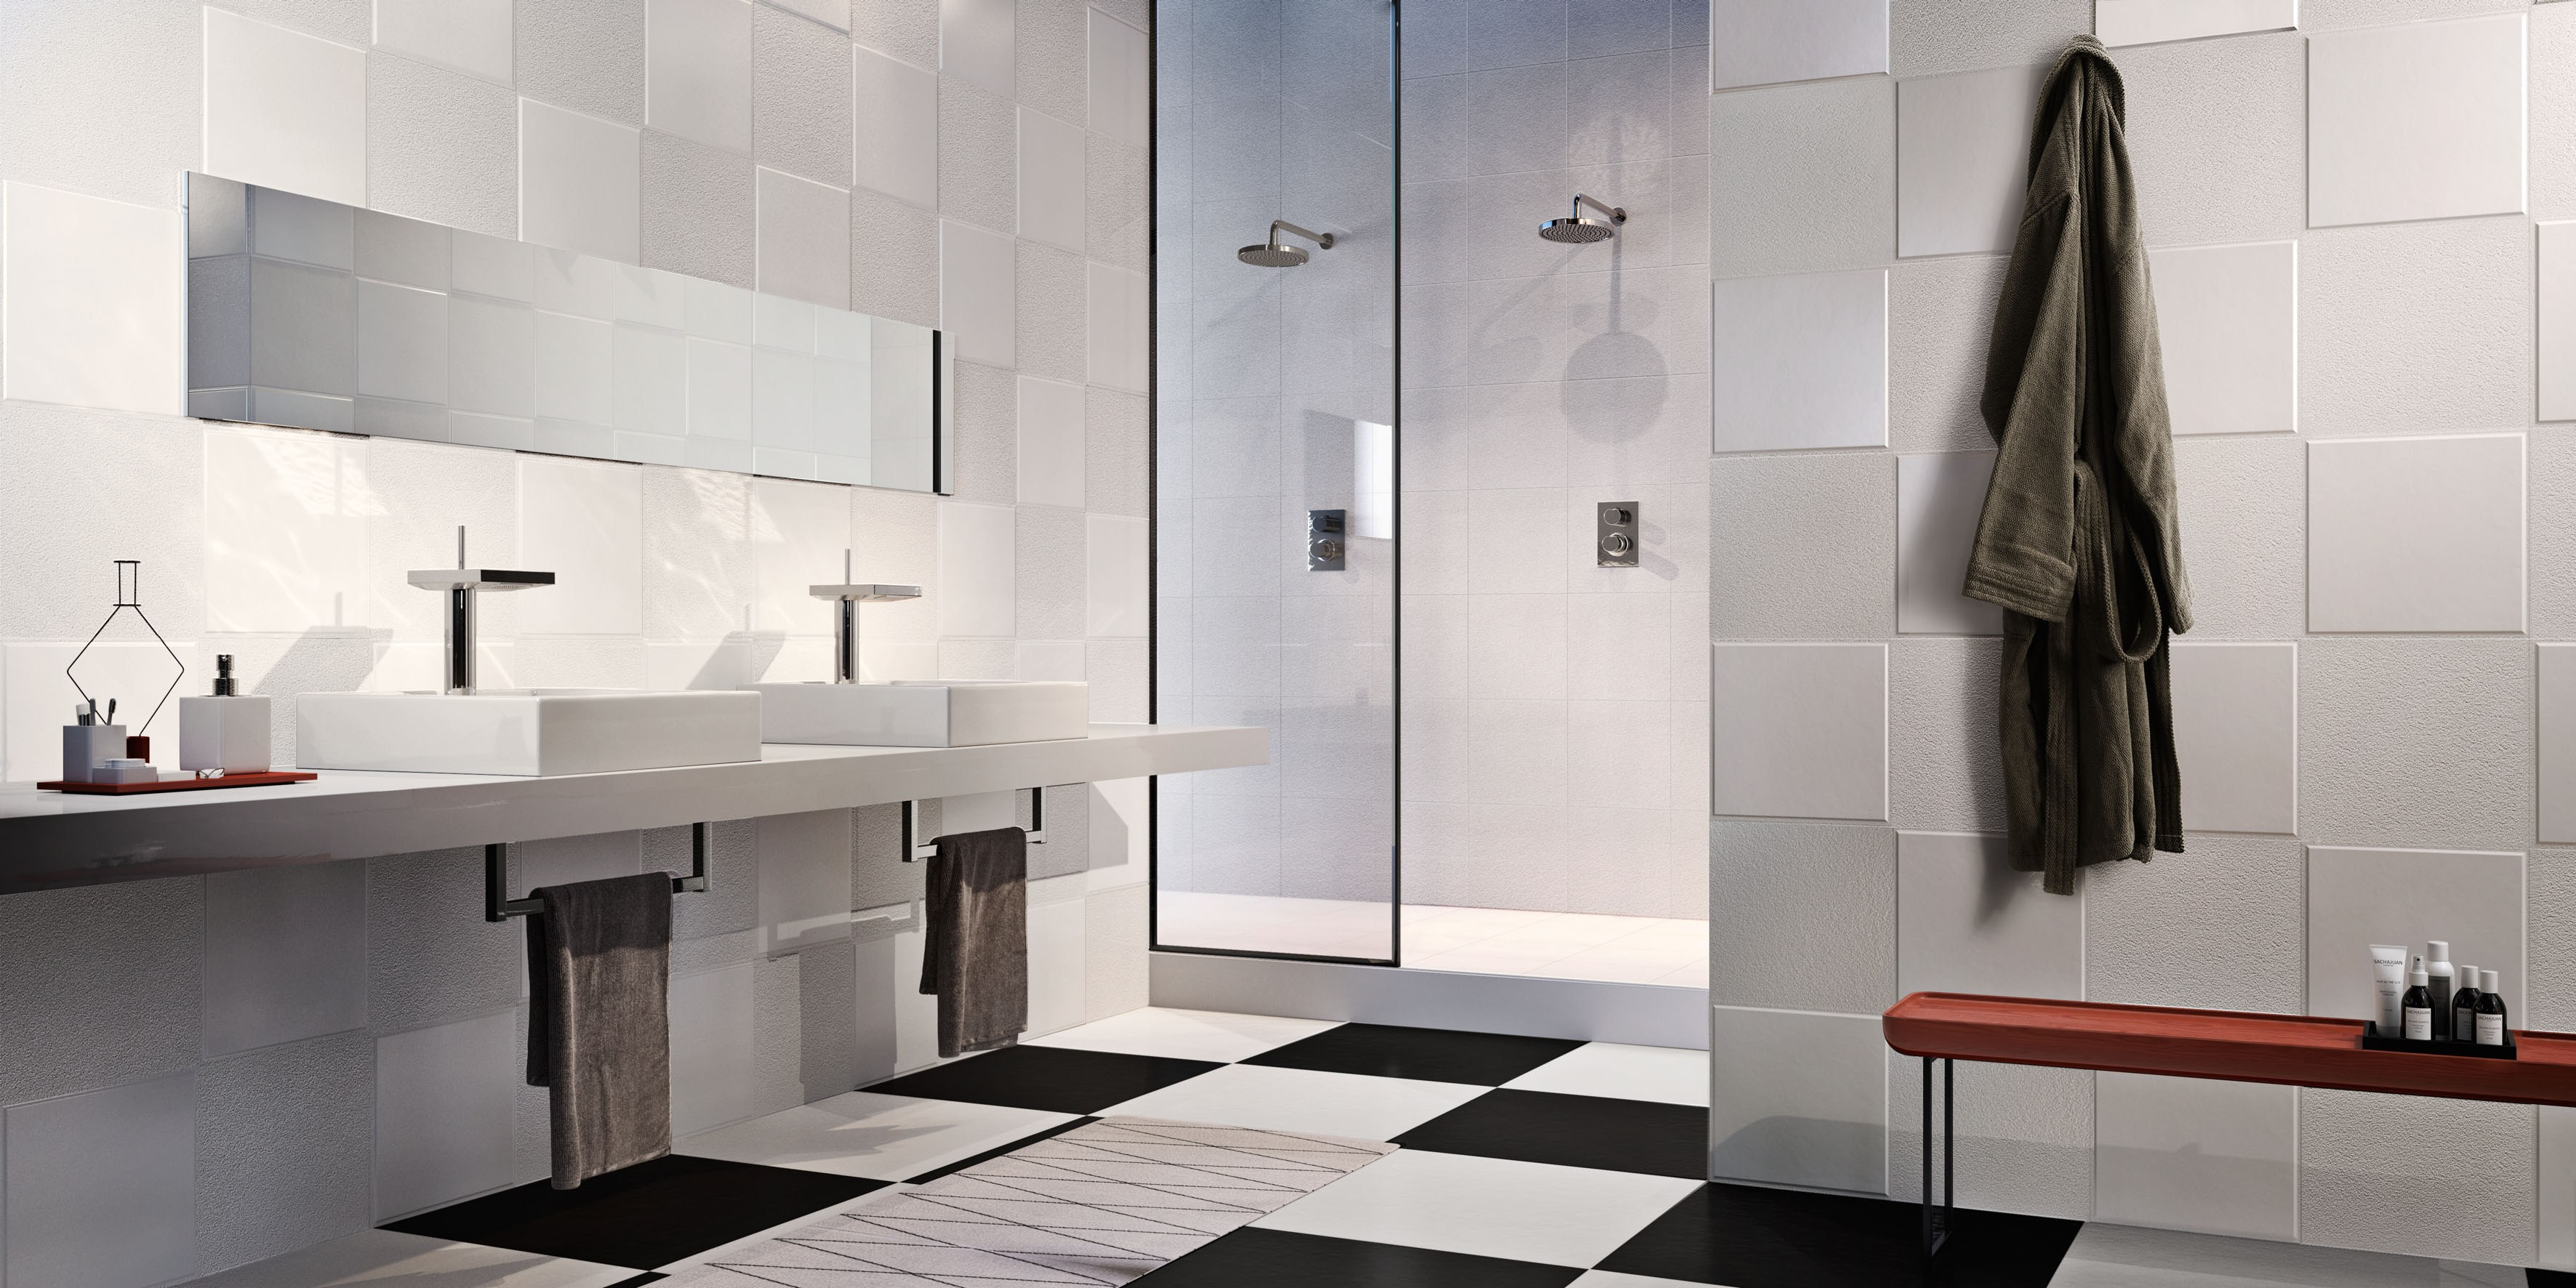 rev tement de sol mur en gr s c rame flexi technic by ceramica sant 39 agostino design philippe starck. Black Bedroom Furniture Sets. Home Design Ideas